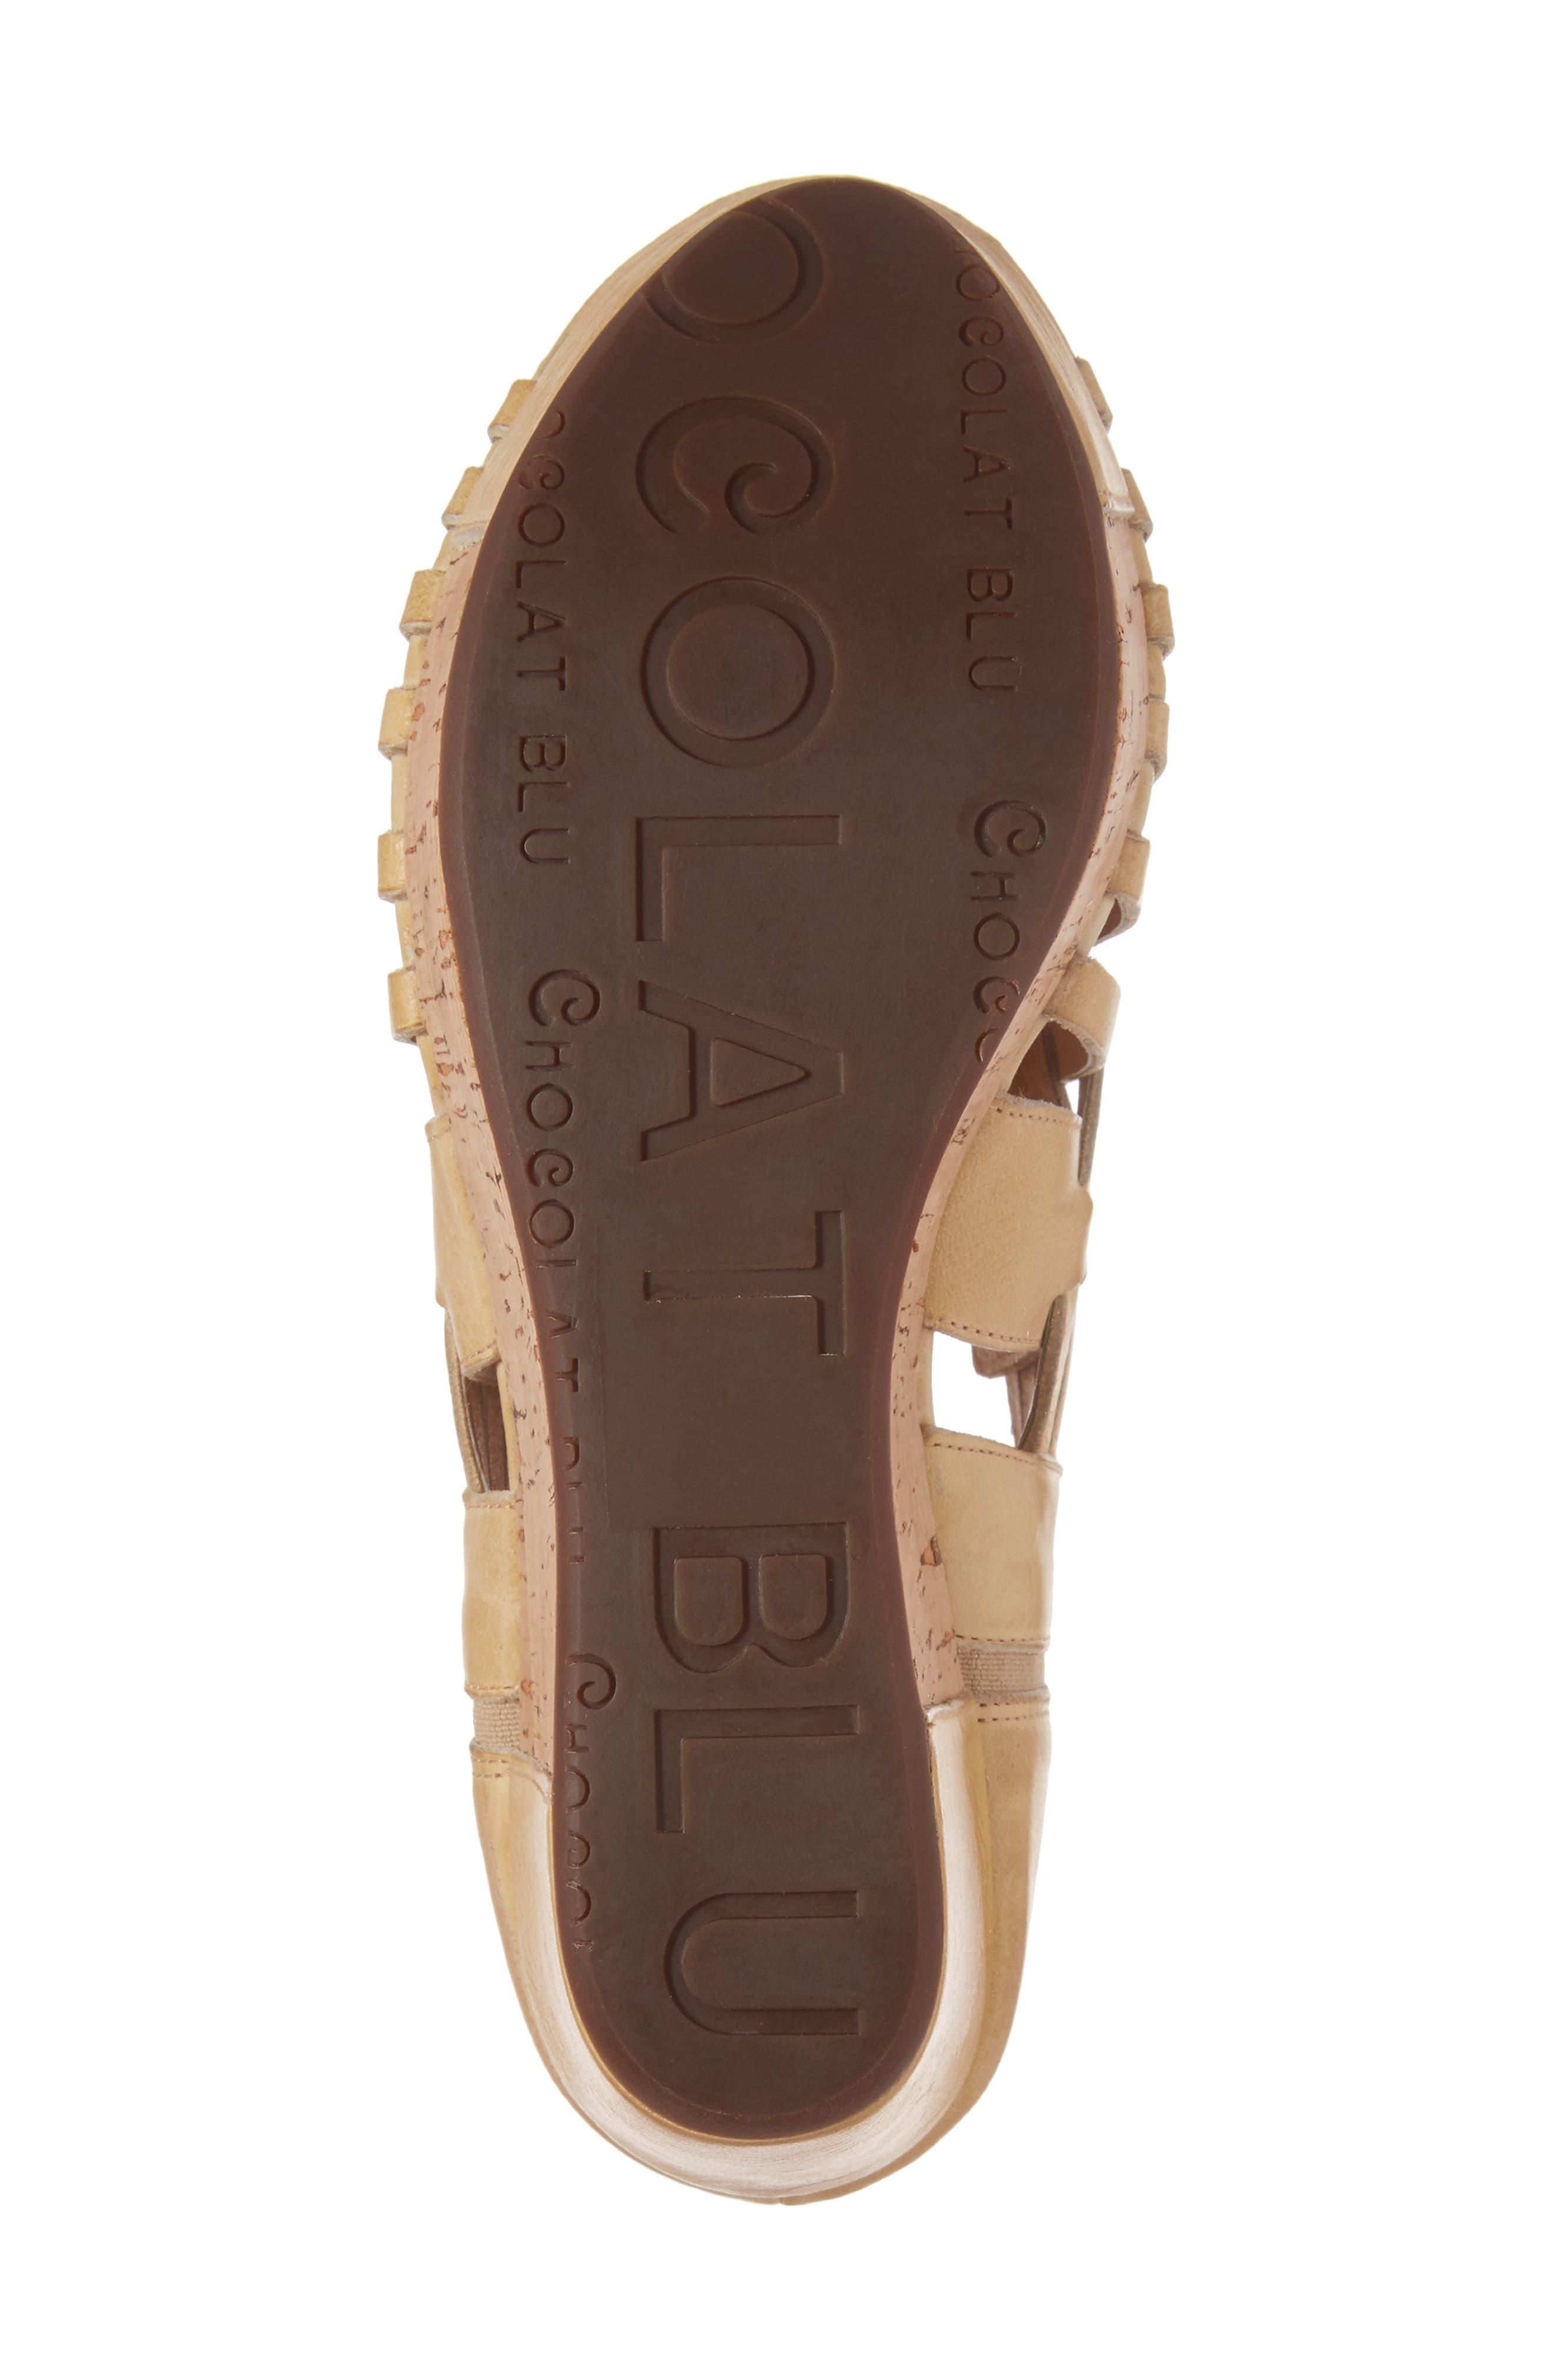 Vic Platform Sandal,                             Alternate thumbnail 5, color,                             Natural Leather